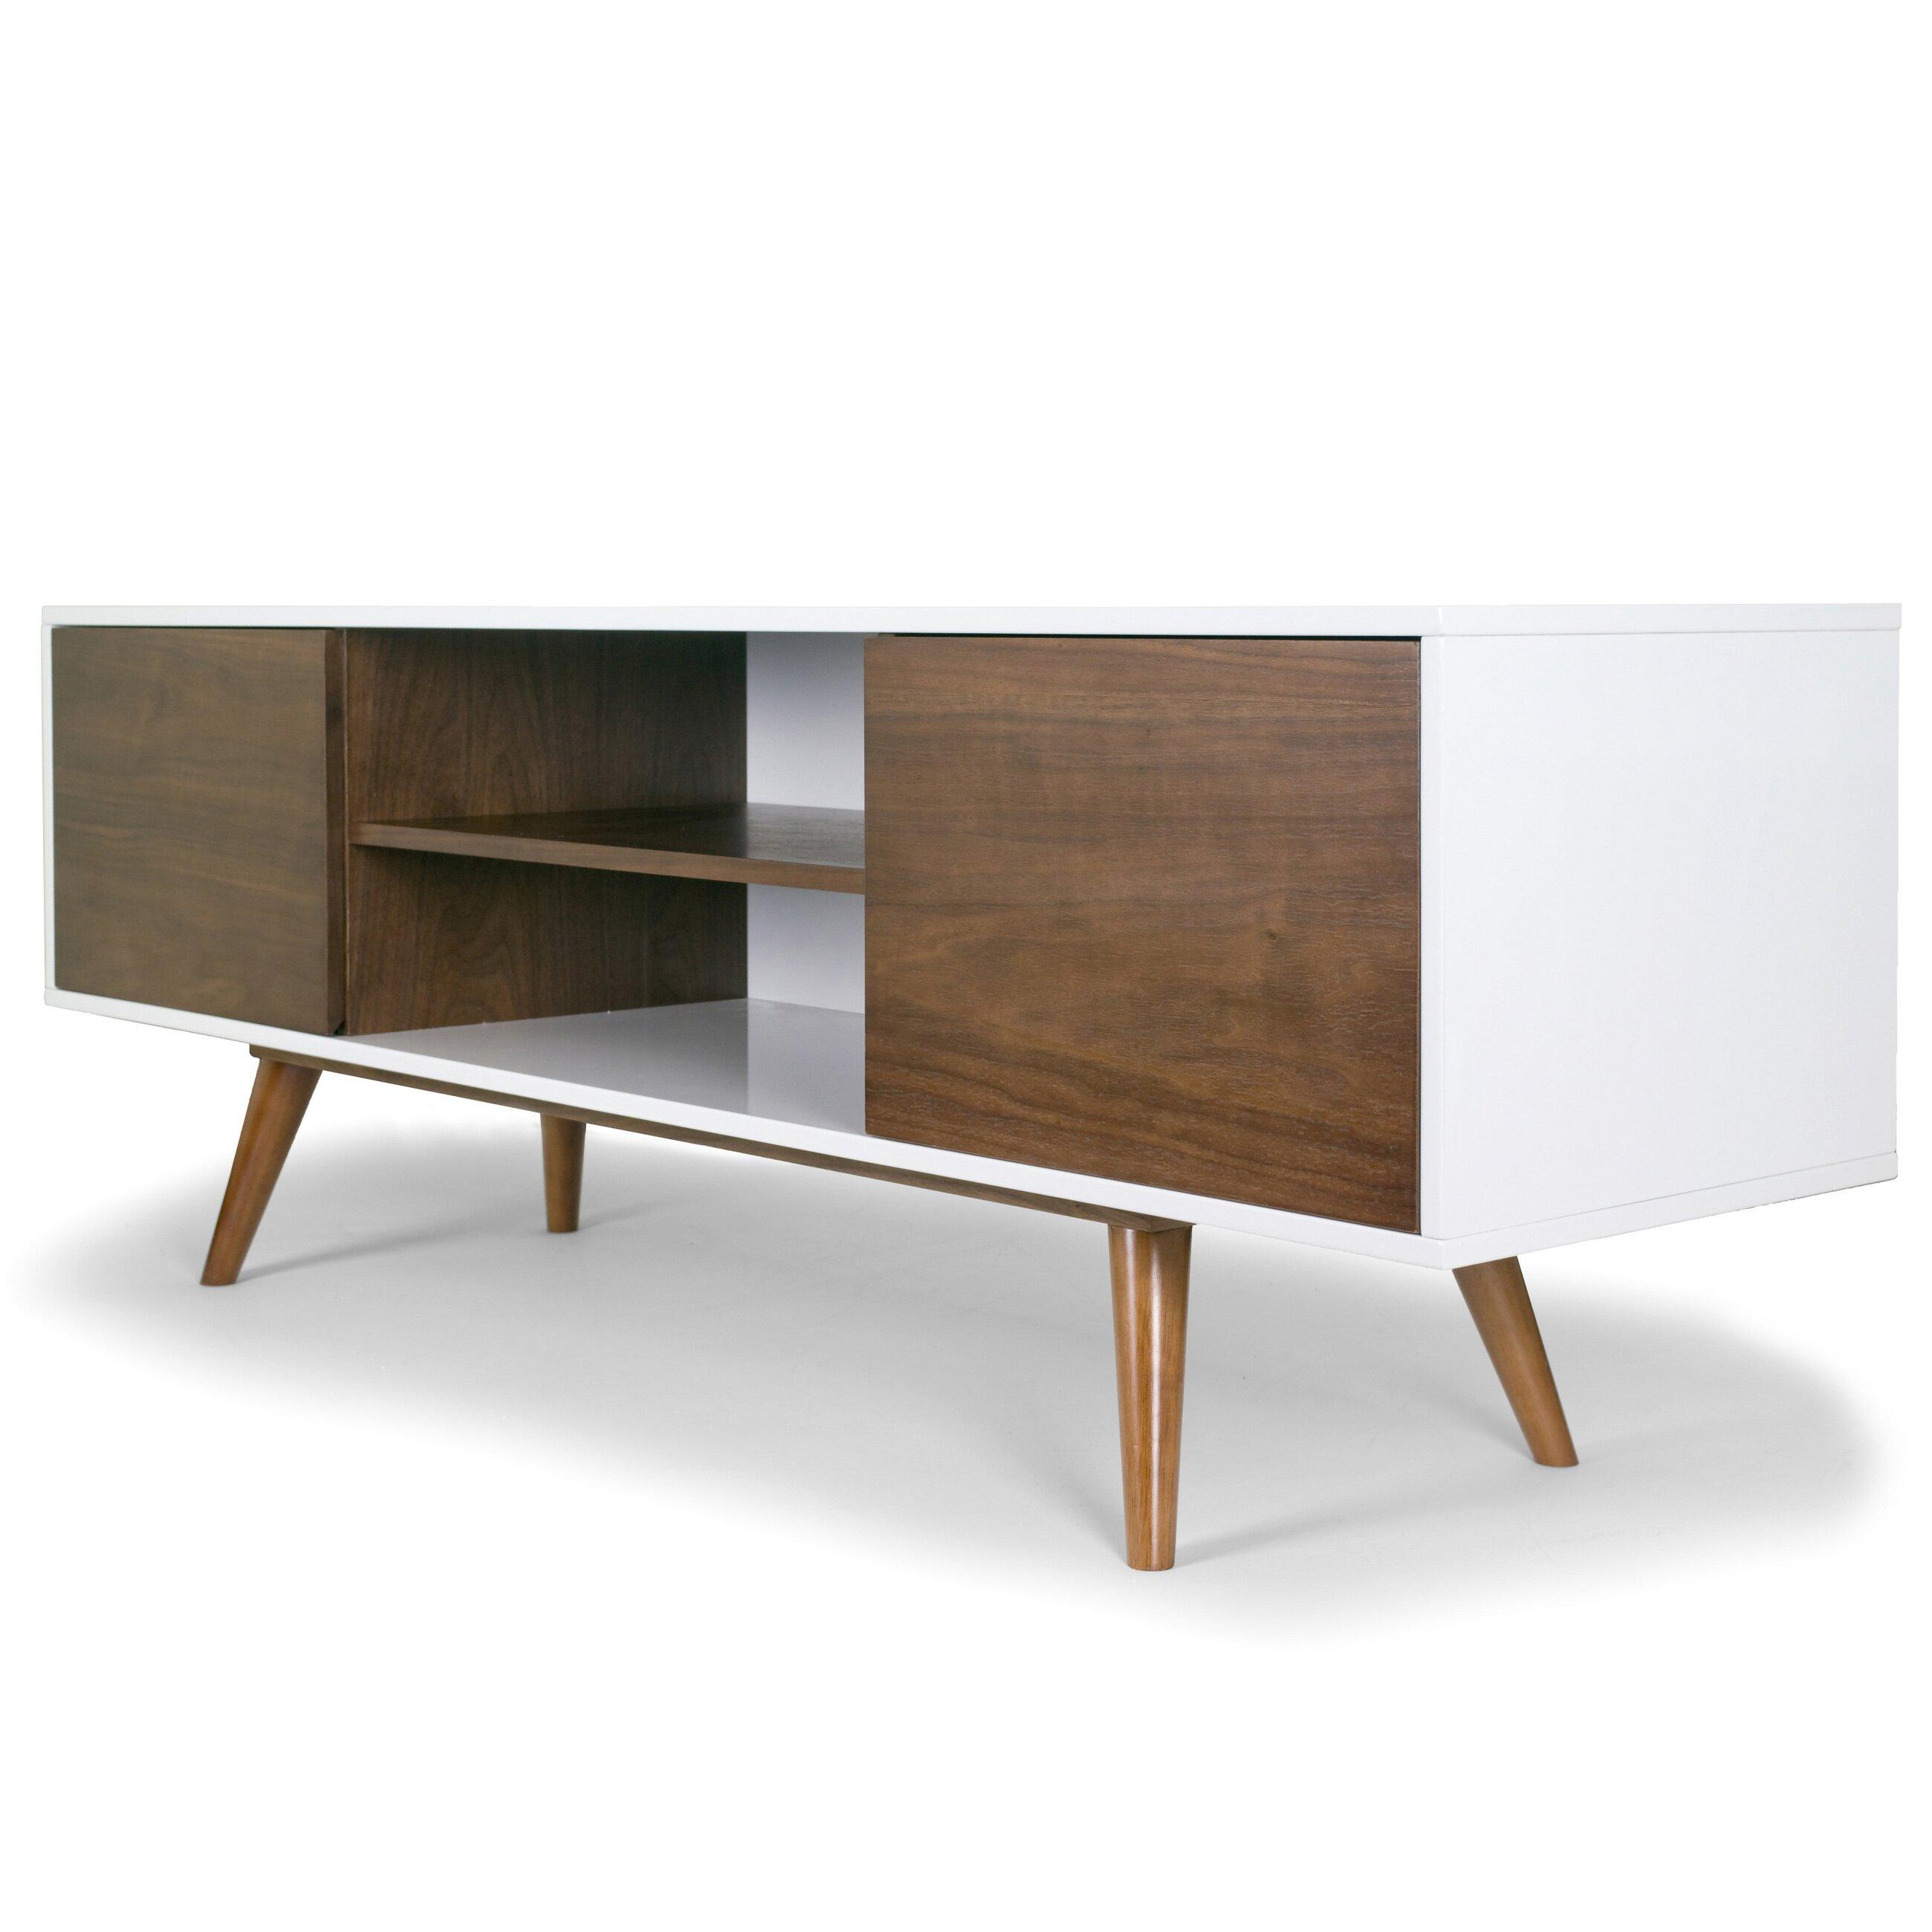 Glamour Home Decor Ailsa Scandinavian Style TV Stand